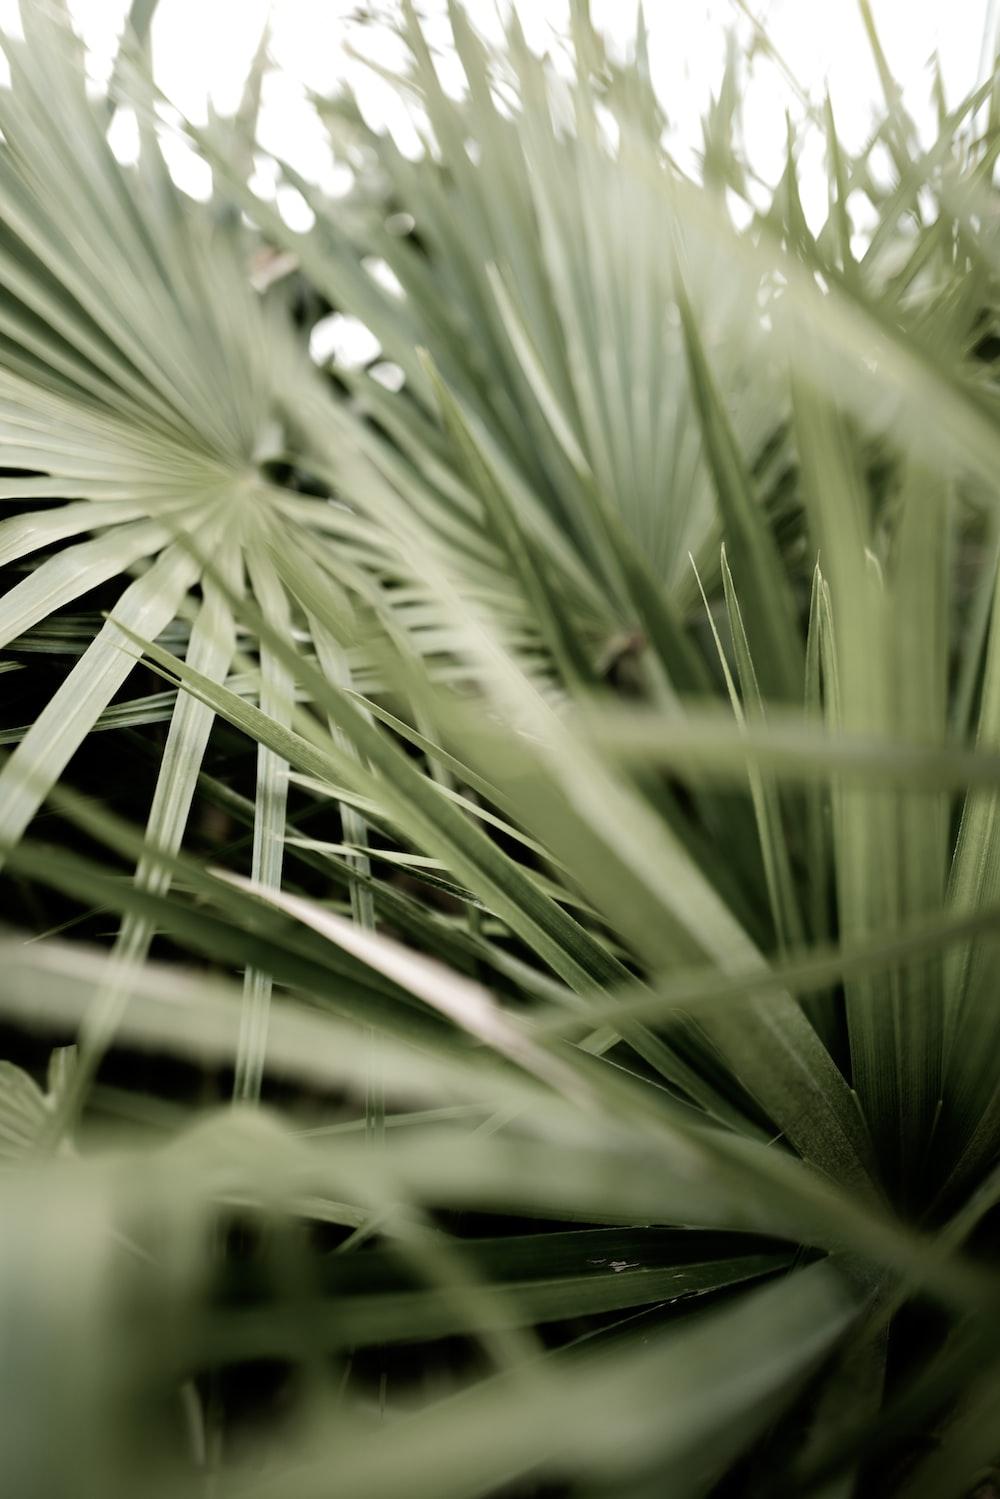 green grass in macro lens